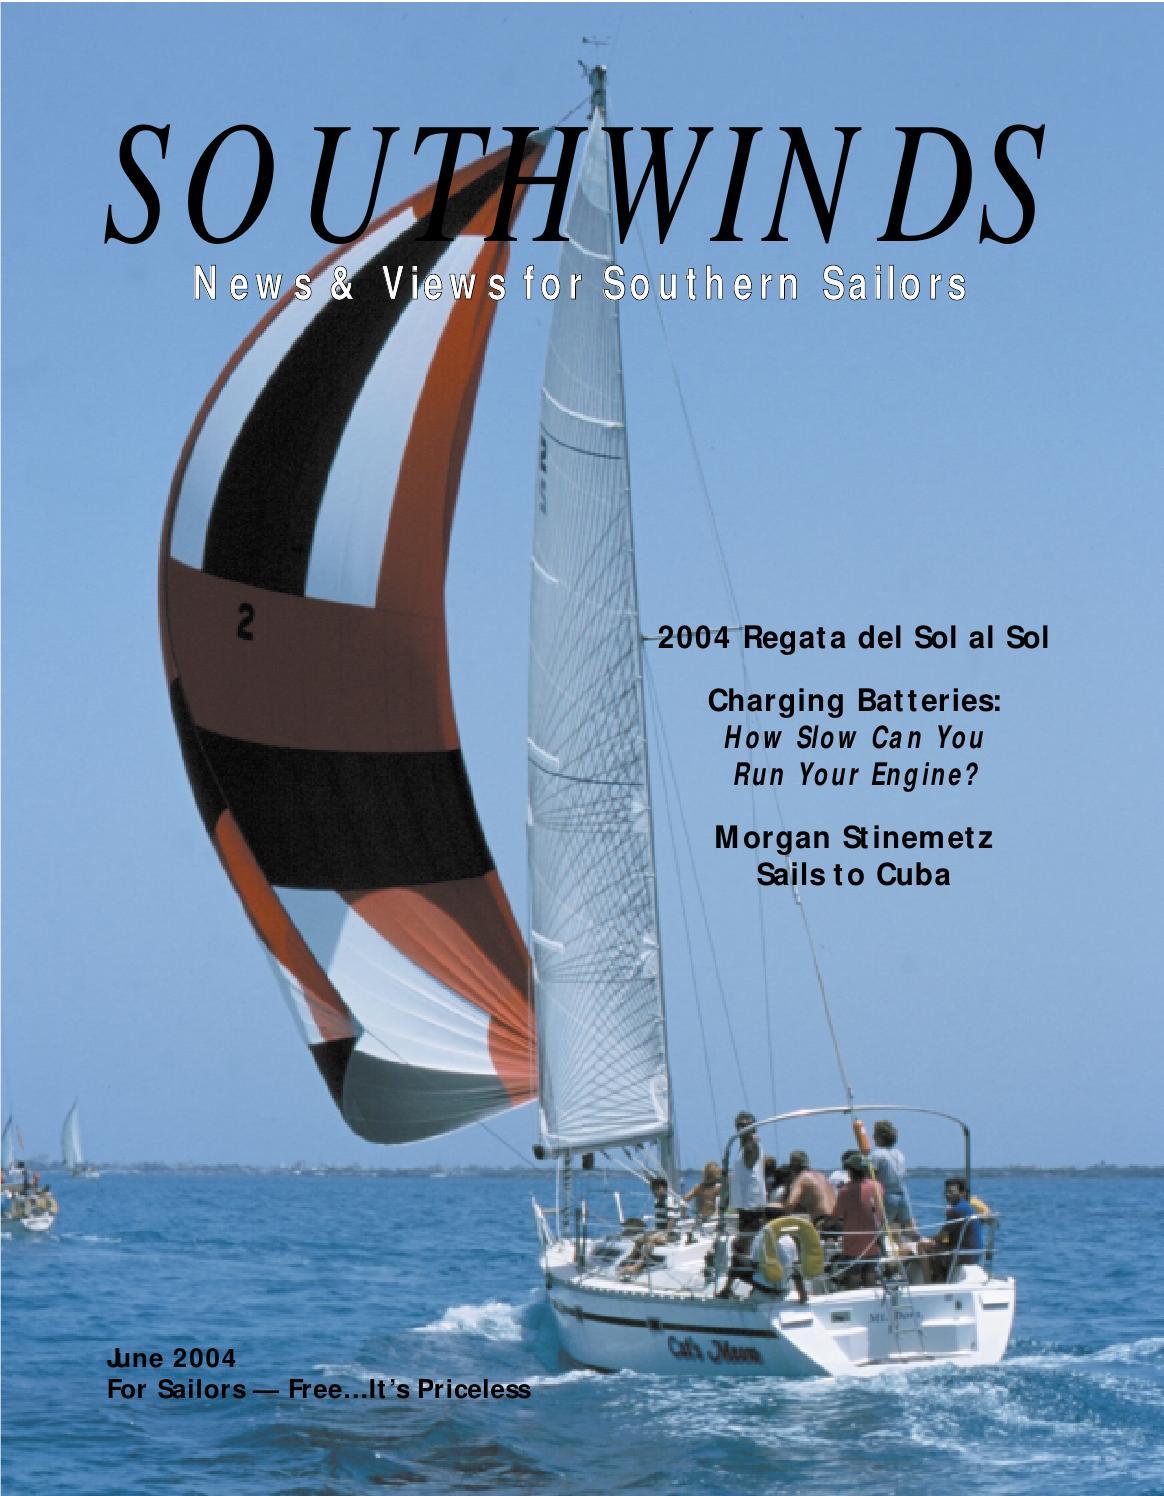 Southwindsjune2004 By Southwinds Magazine Issuu Maclube Electric Fuel Pump Instruction Sheet